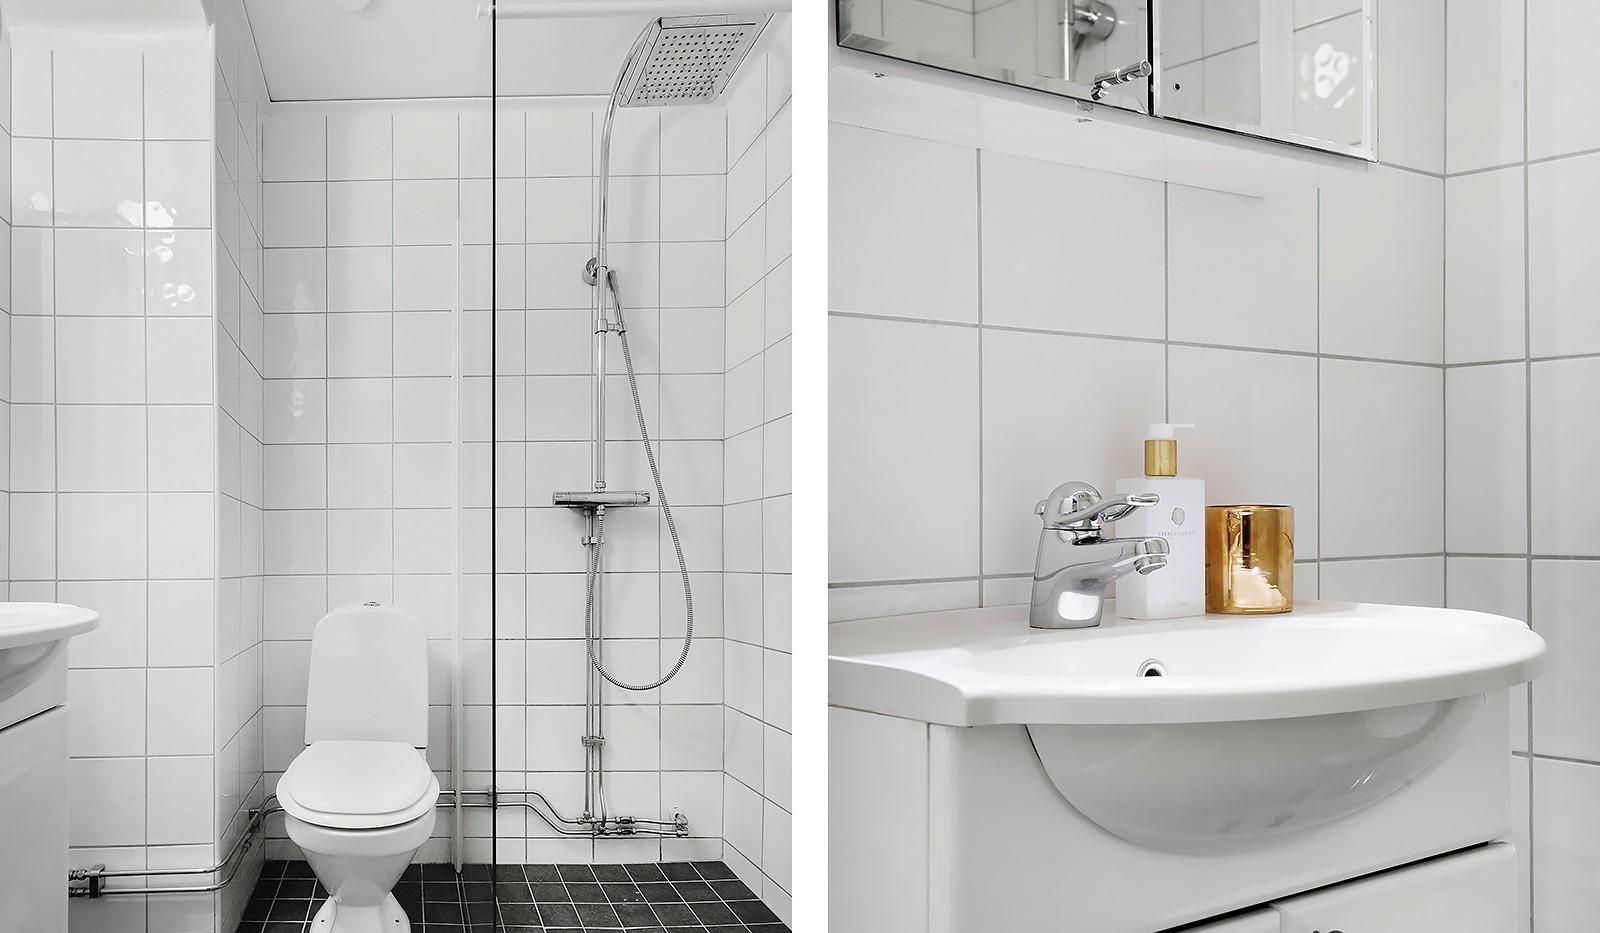 Timmermansgatan 33 - Helkaklat badrum